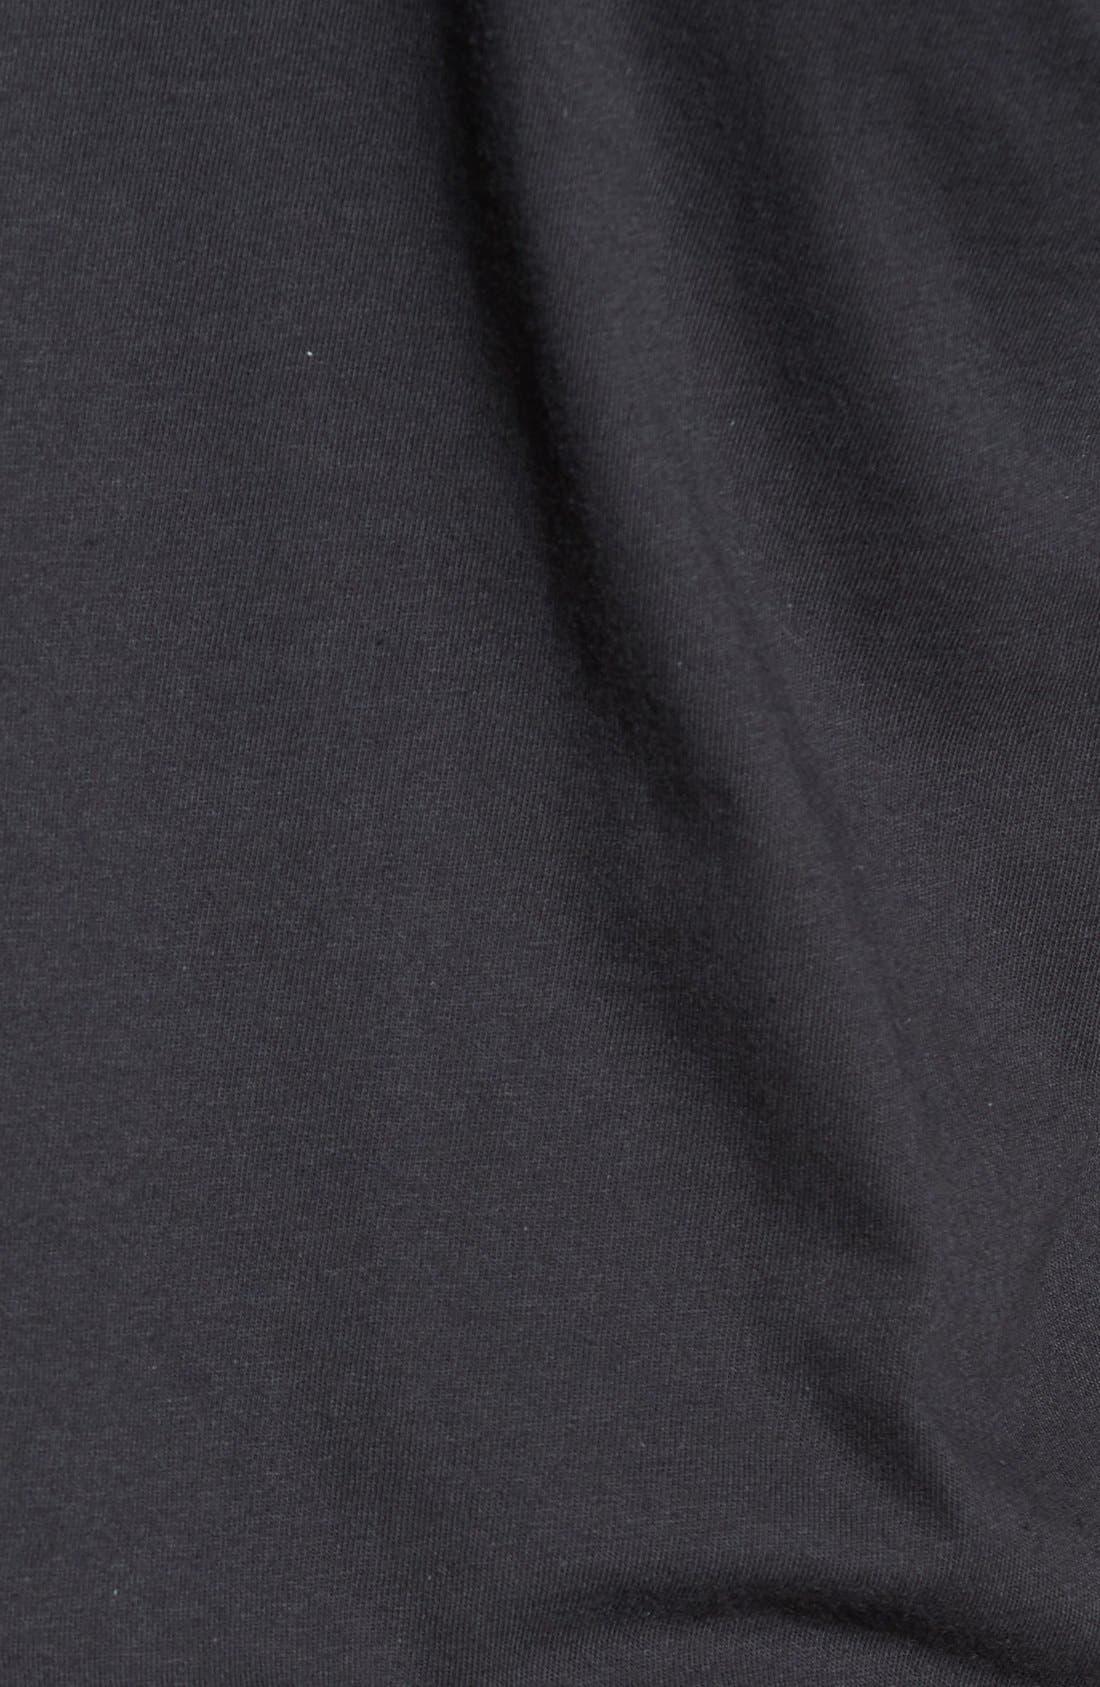 USA Graphic T-Shirt,                             Alternate thumbnail 5, color,                             Black